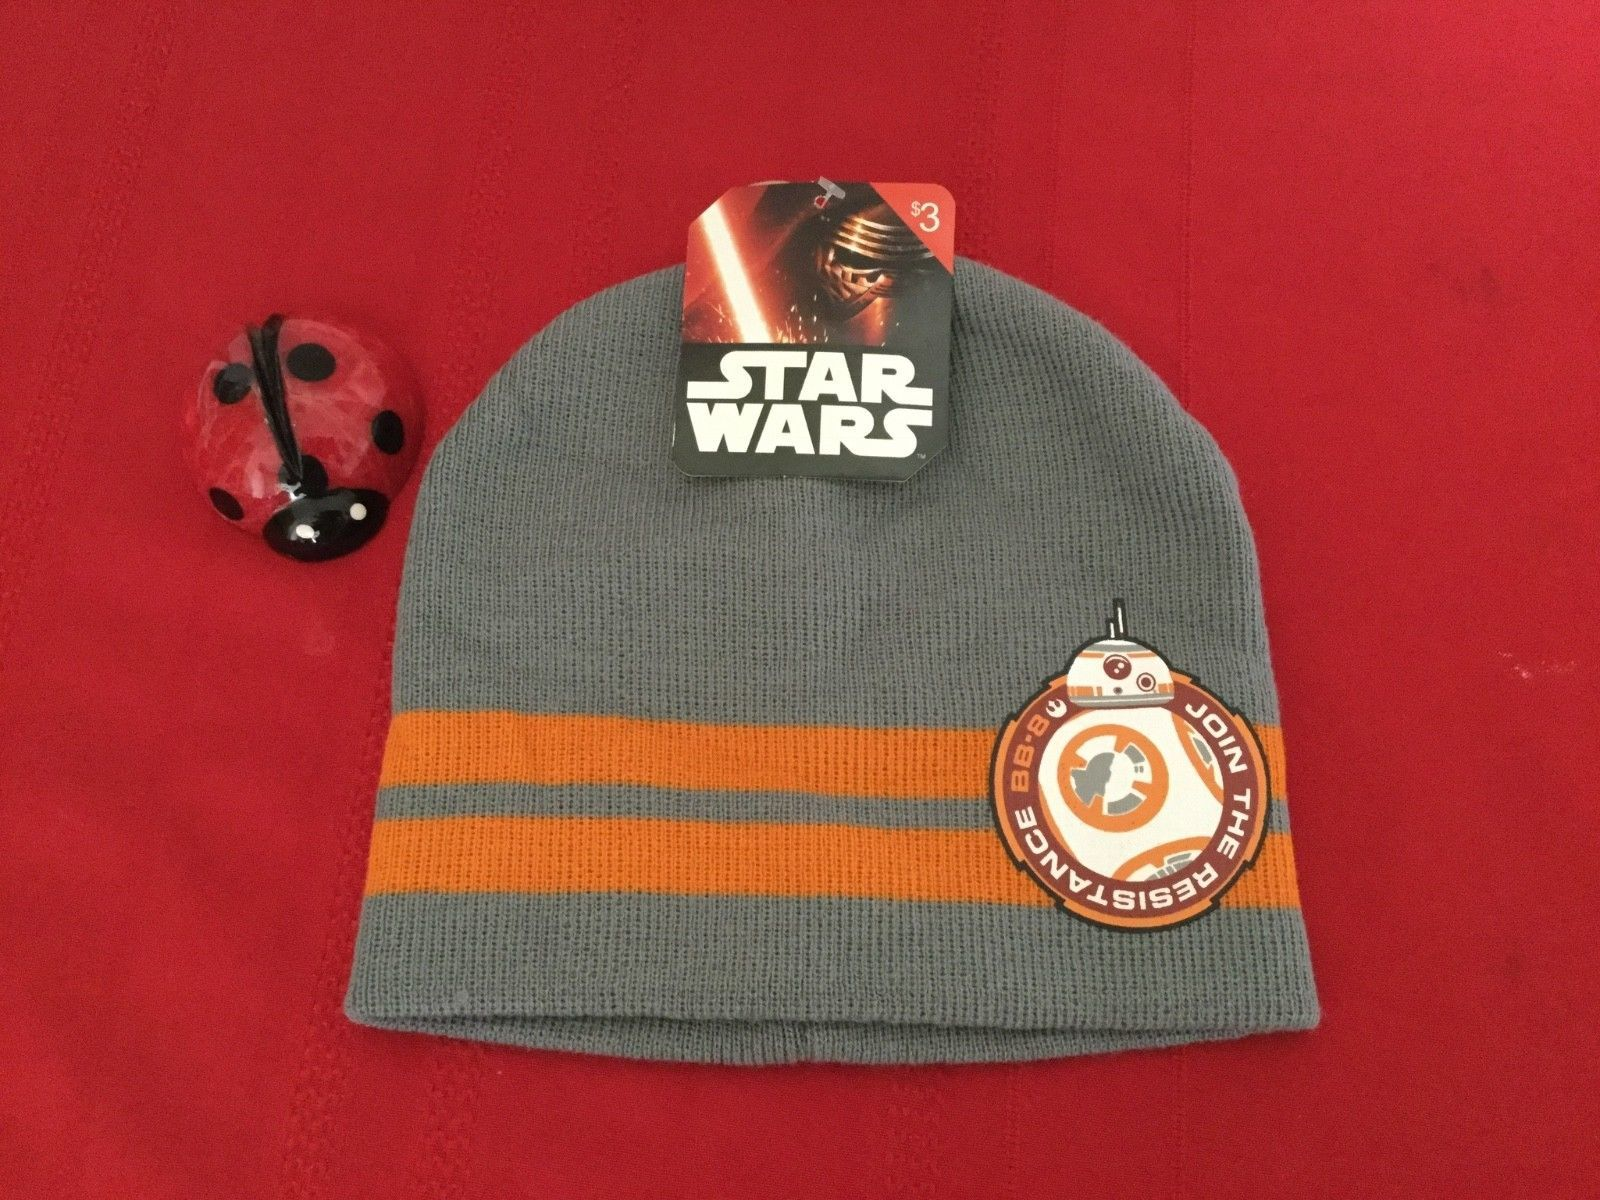 Star Wars Beanie Hat Darth Vader Kylo Ren BB-8 Awekens Free Shipping